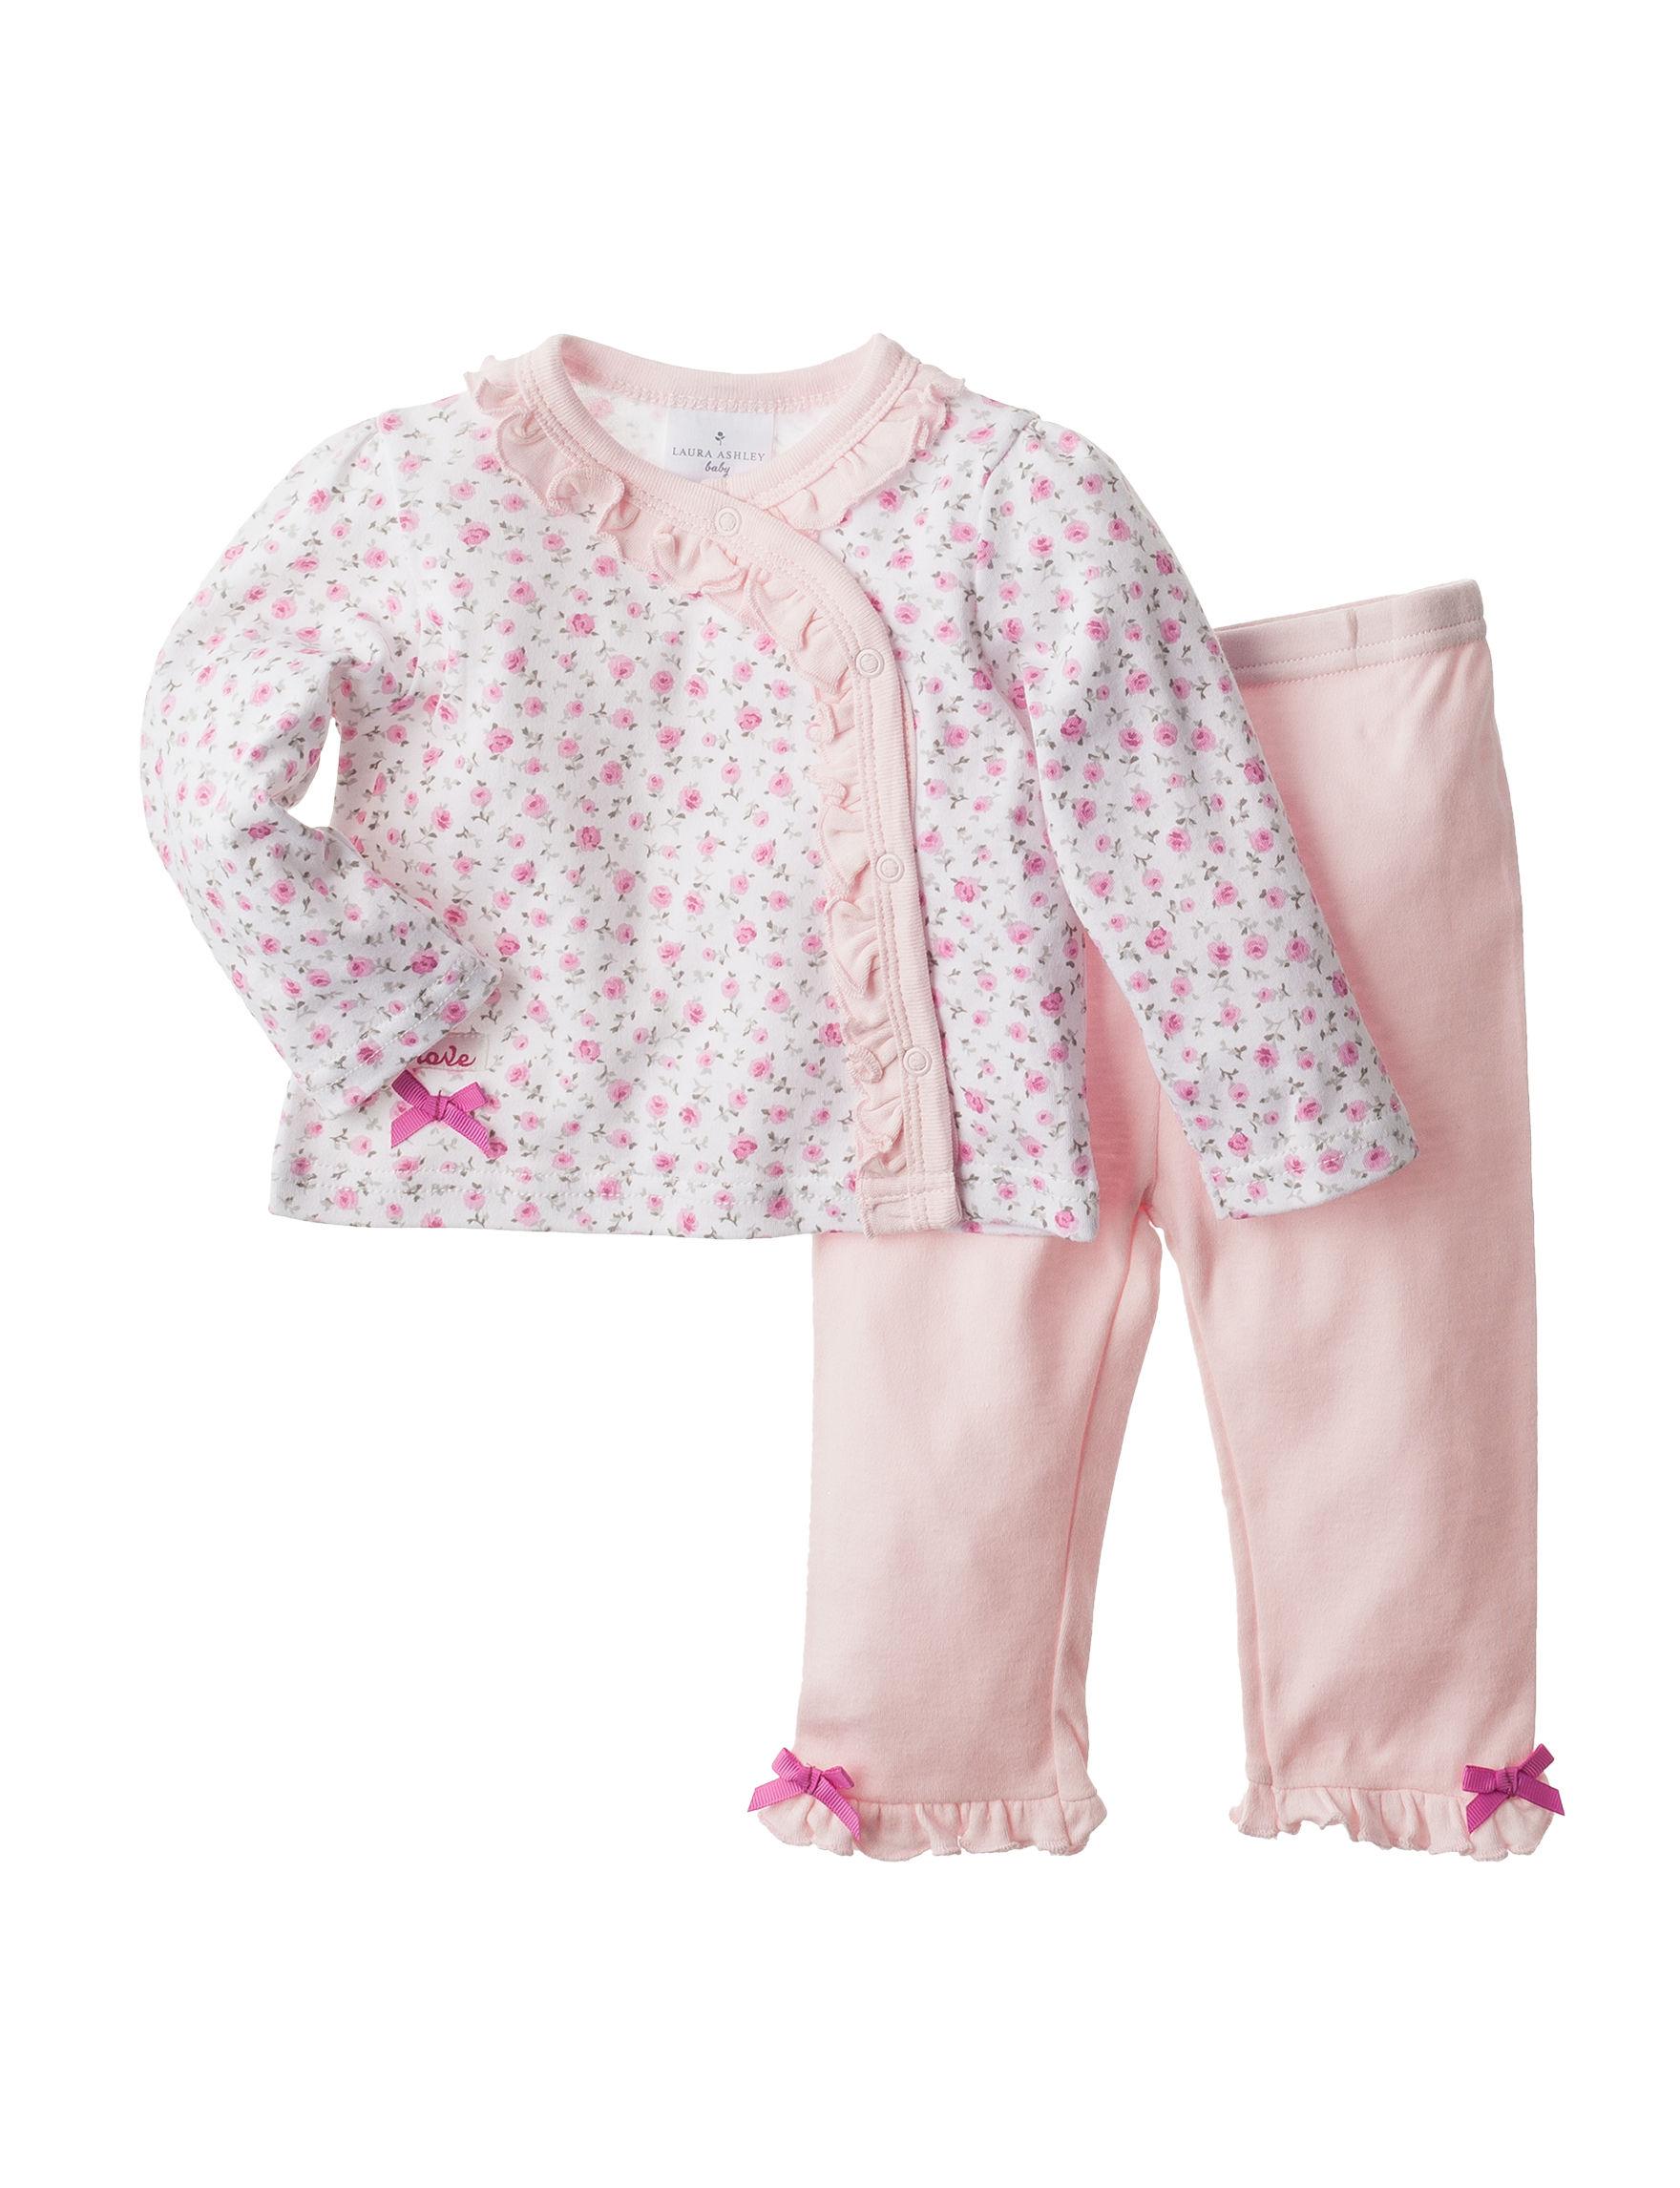 Laura Ashley Medium Pink